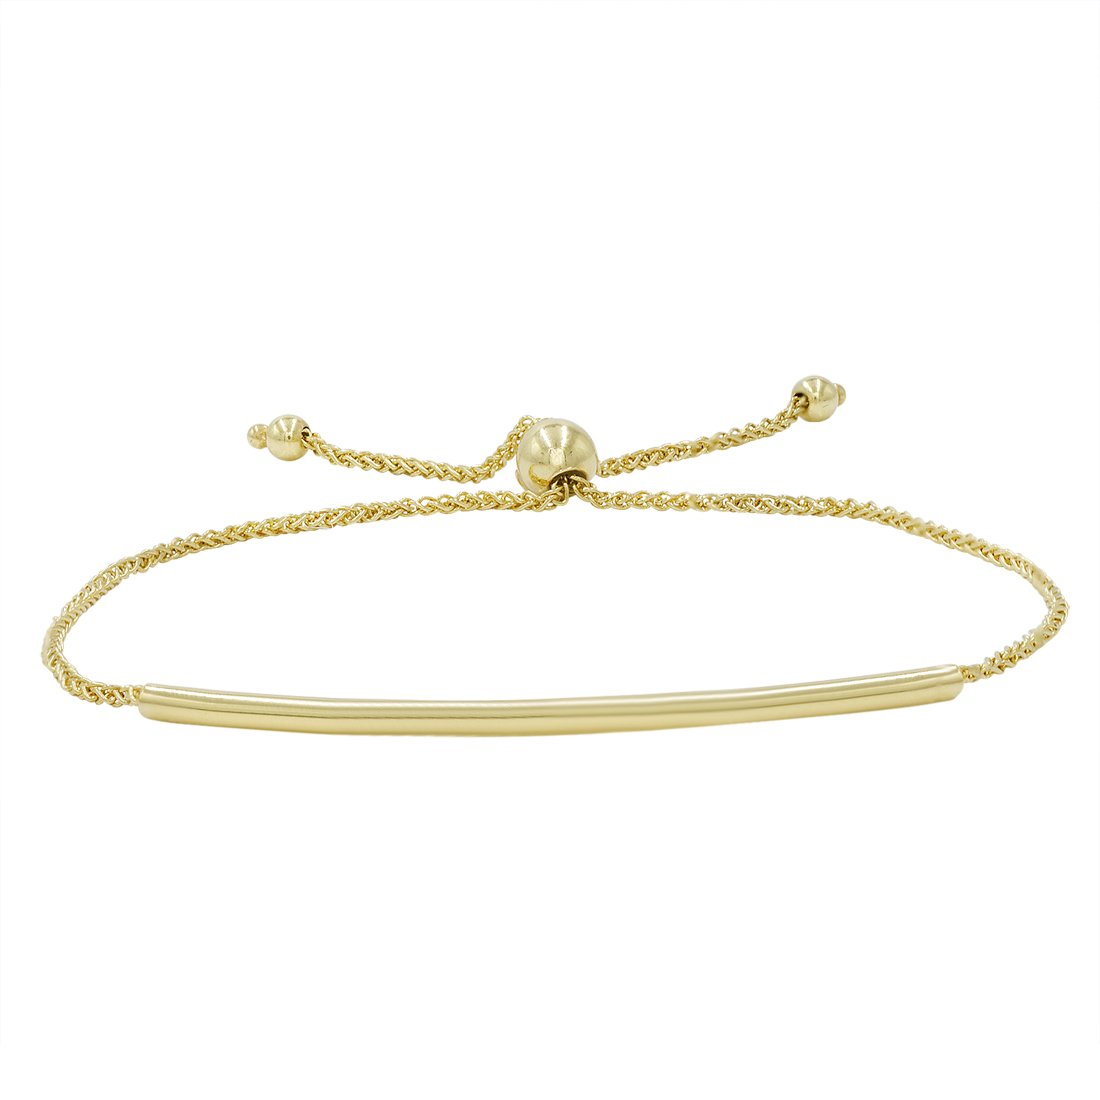 Amanda Rose Bar Bolo Bracelet in 14k Yellow Gold (Adjustable)